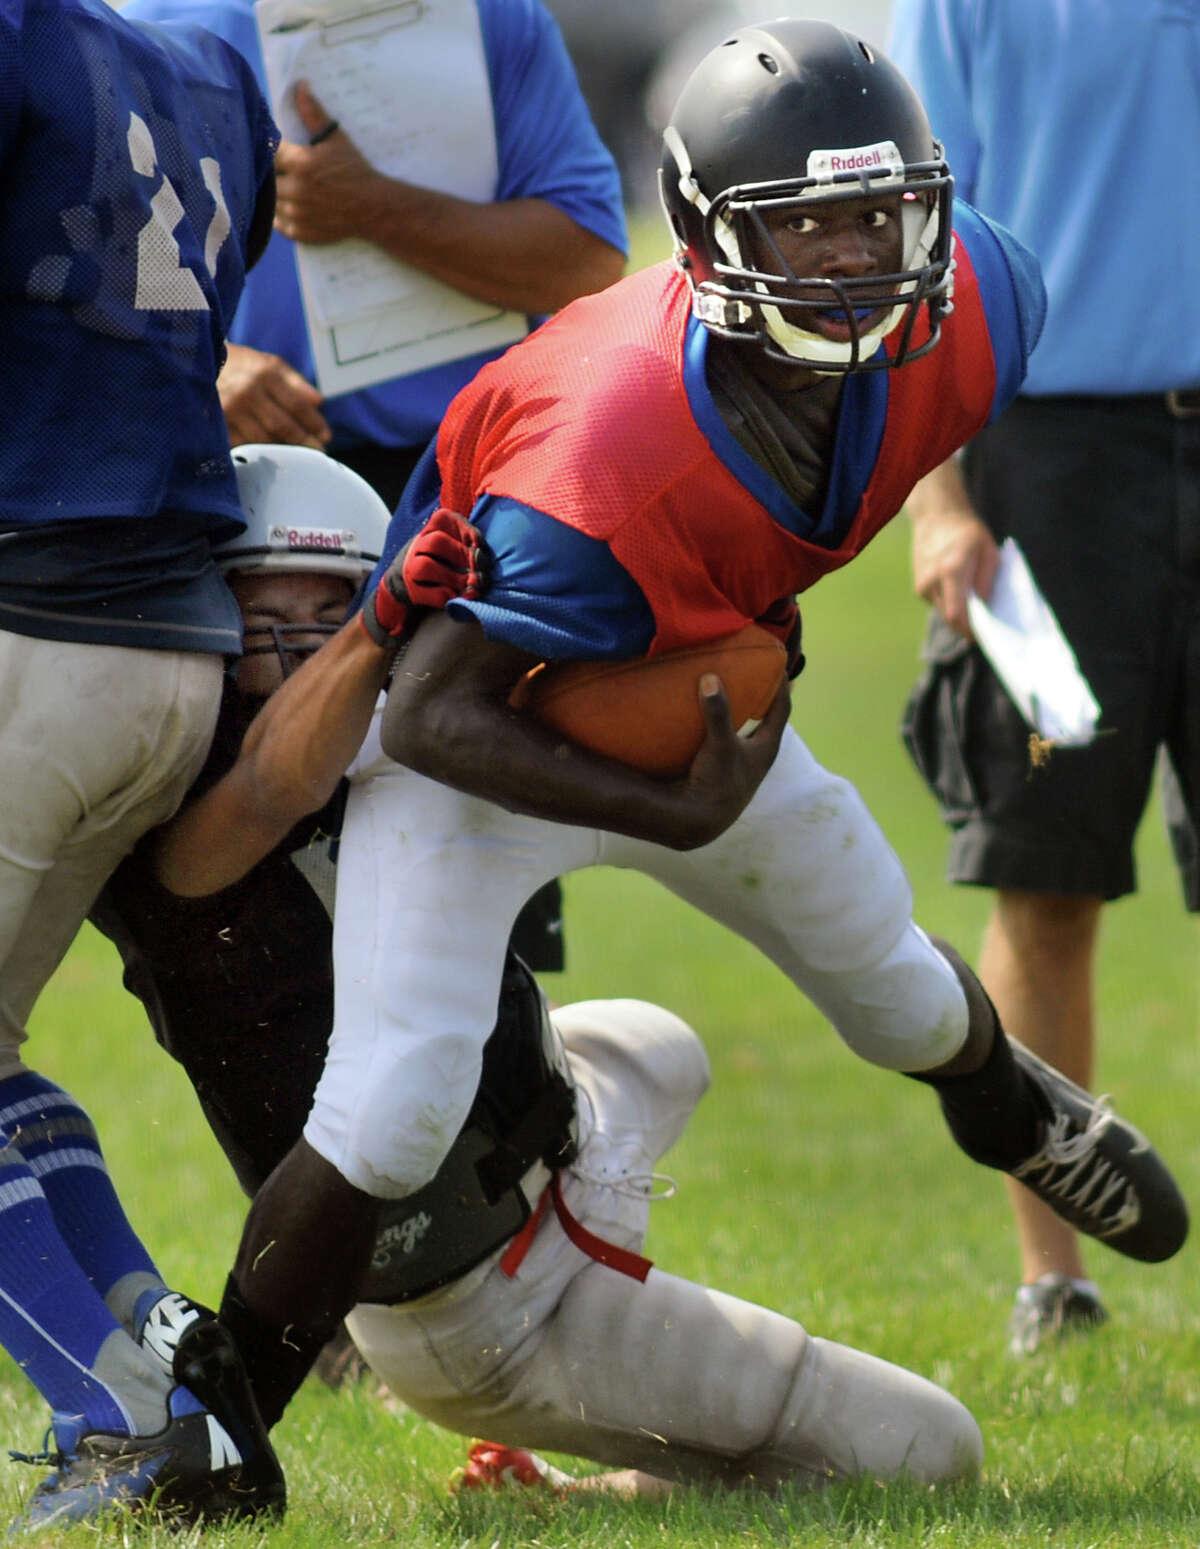 Albany quarterback Tyshen Morris, center, fights through a Niskayuna tackle during a scrimmage on Saturday, Aug. 25, 2012, at Niskayuna High in Niskayuna, N.Y. (Cindy Schultz / Times Union)